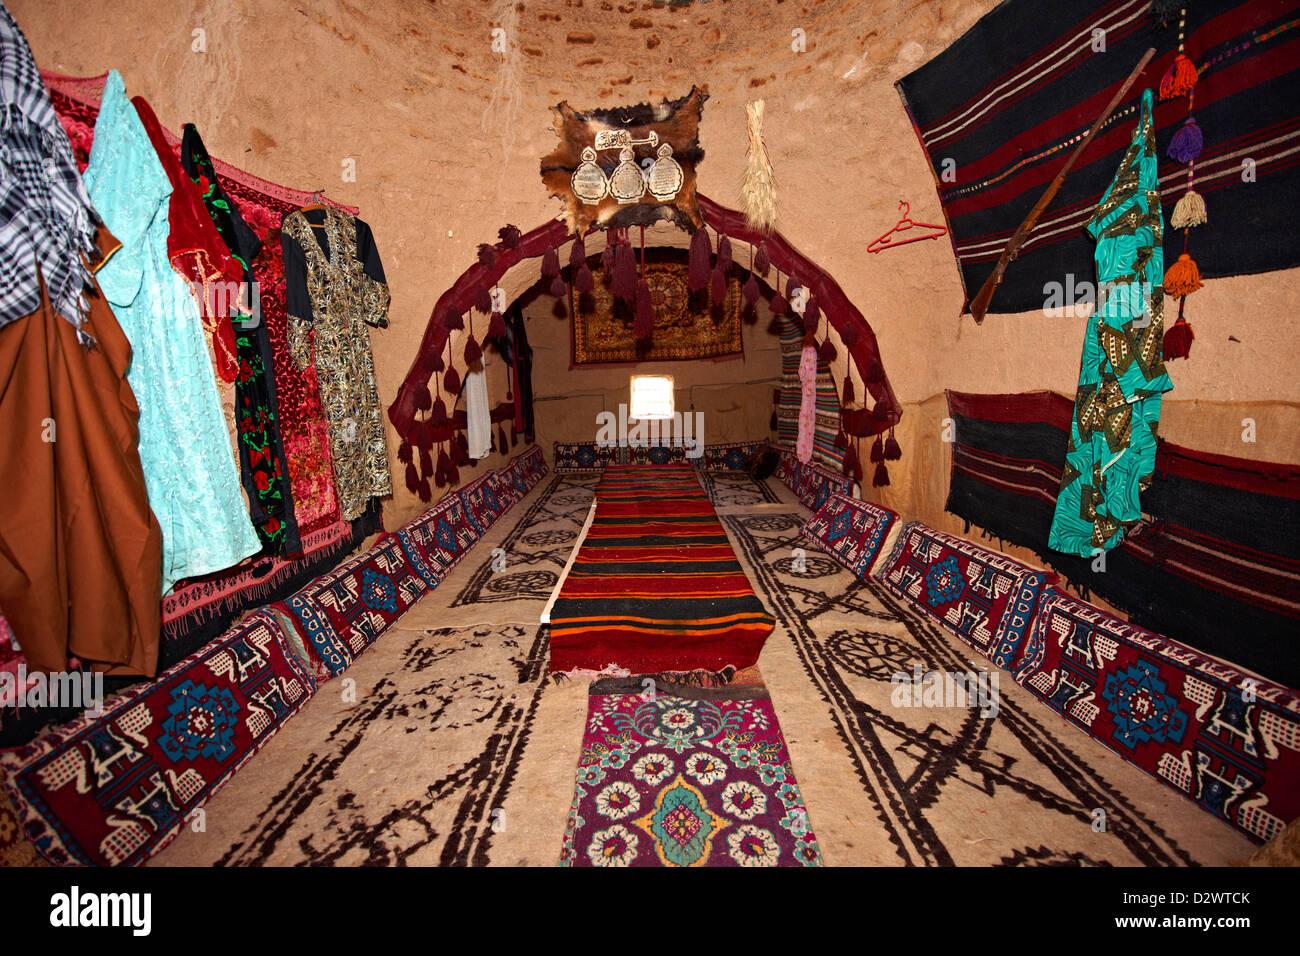 Interior of beehive adobe buildings of Harran, south west Anatolia, - Stock Image